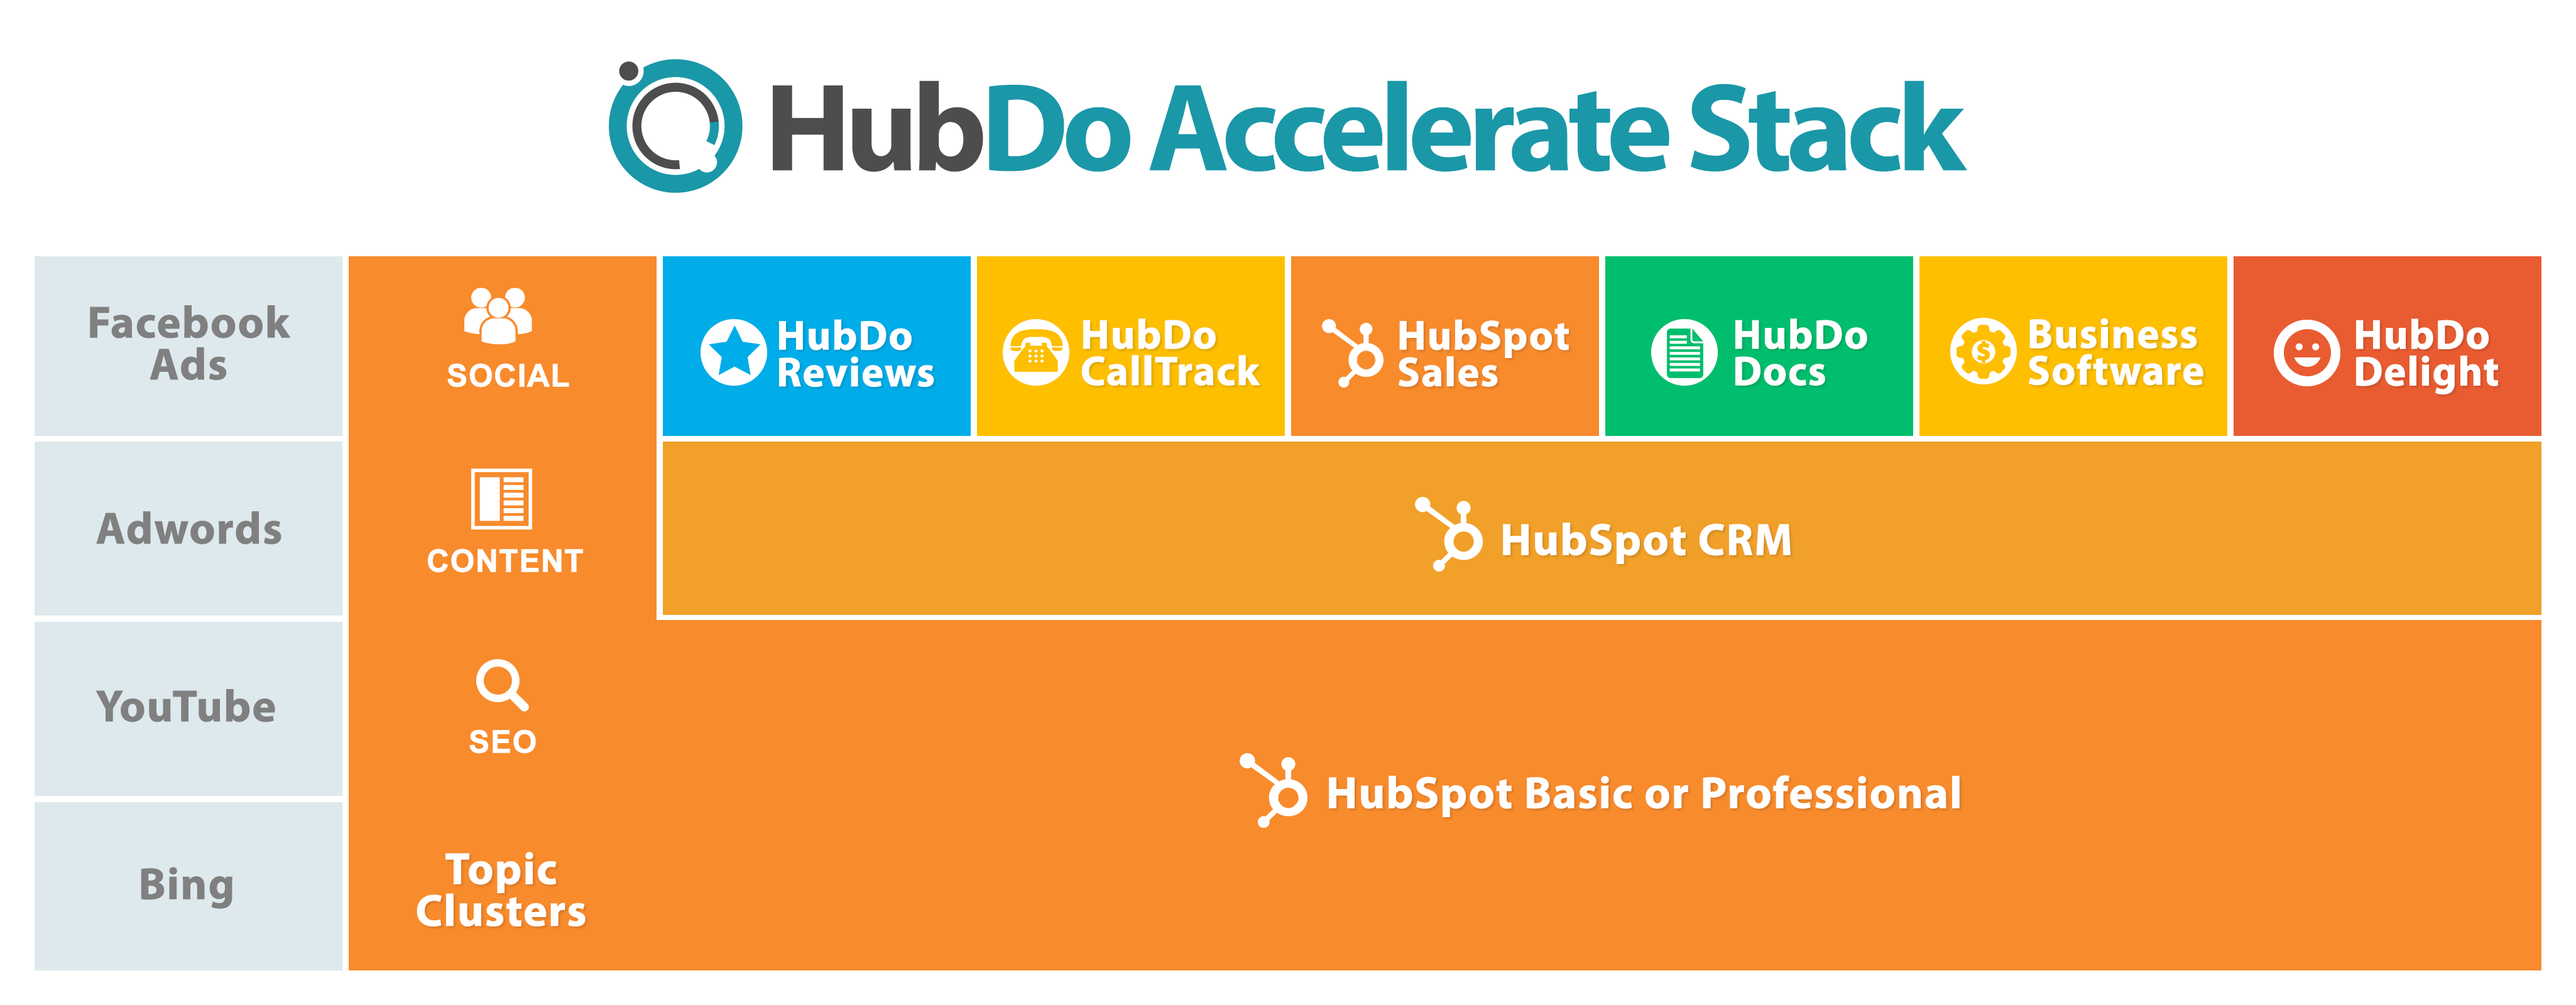 HubDo Accelerate Stack.png